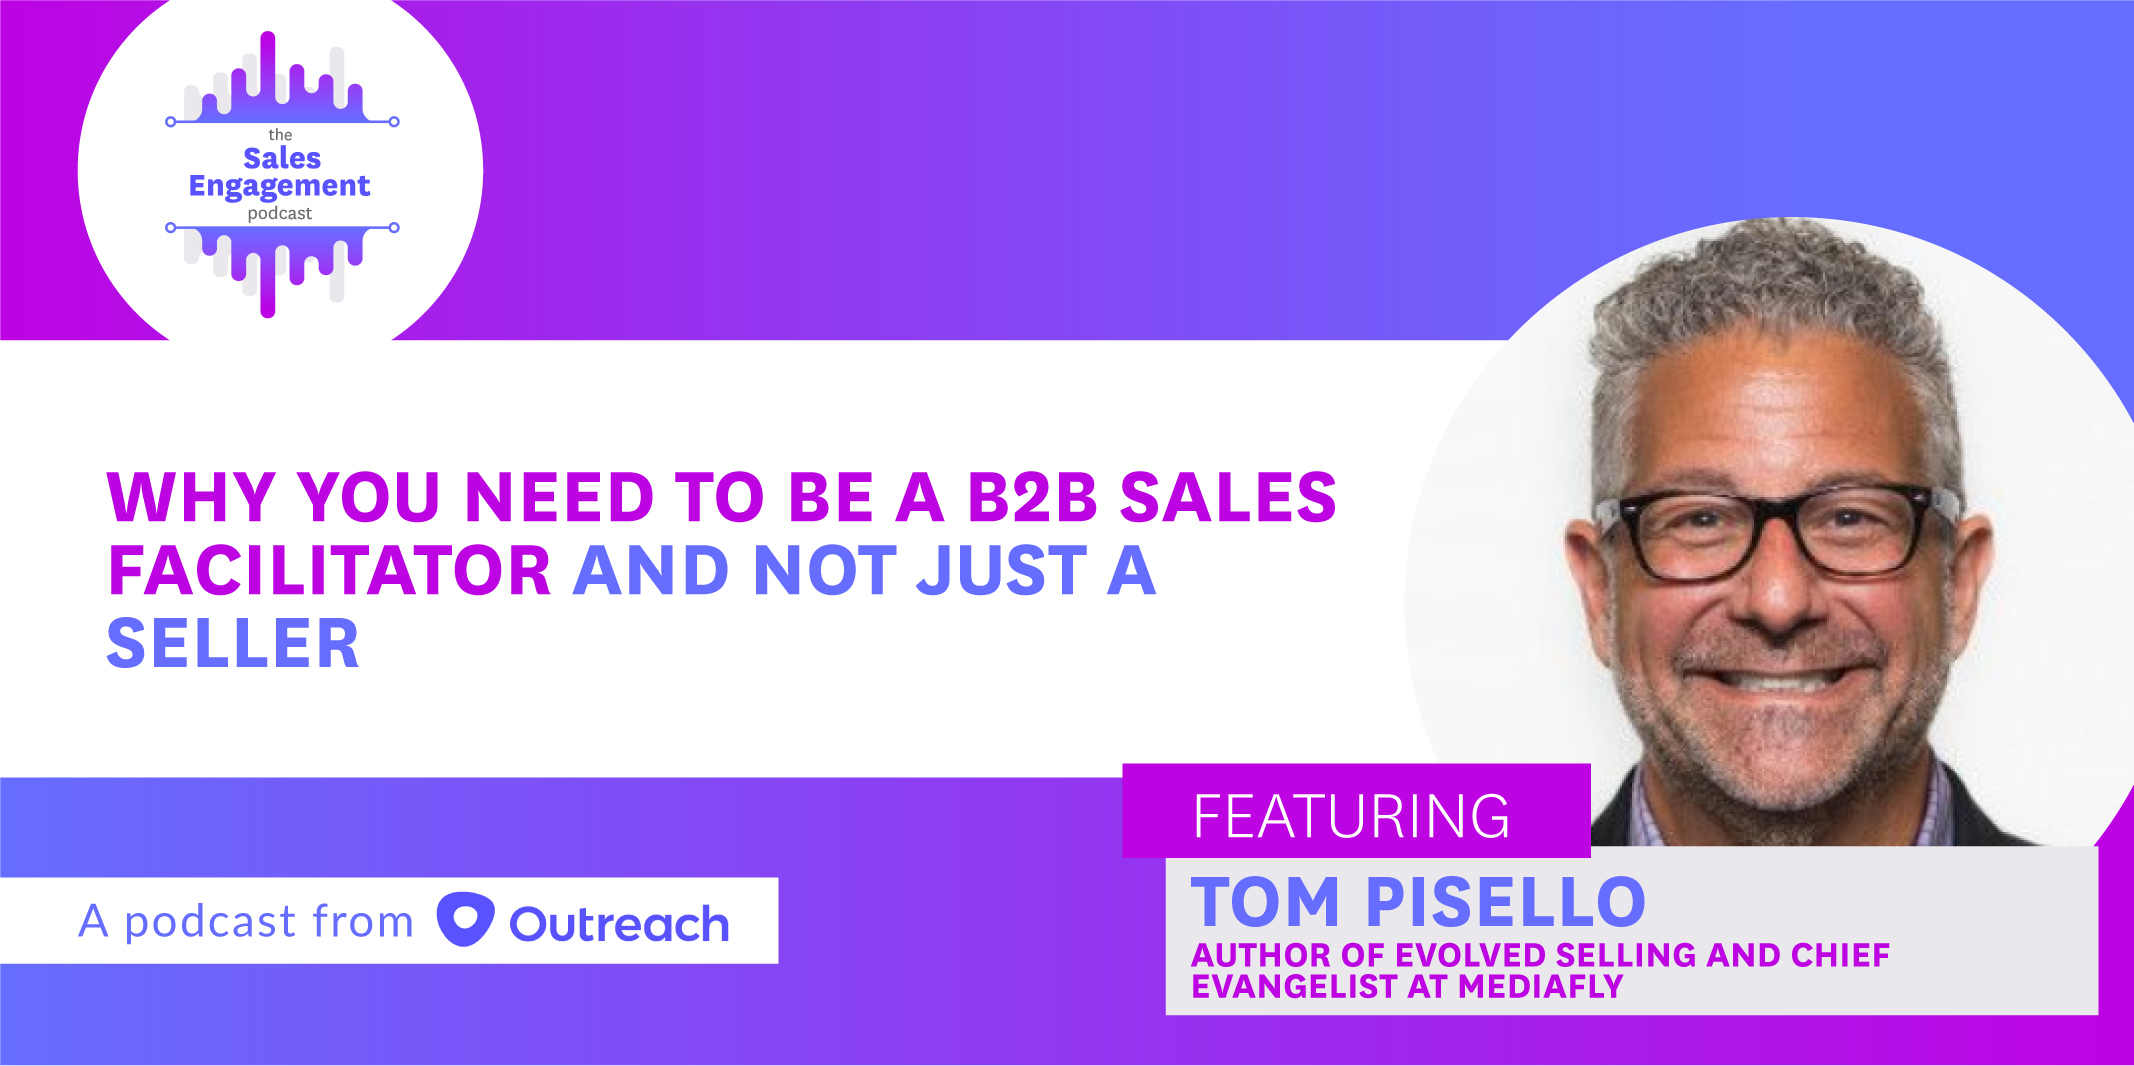 The_Sales_Engagement_Podcast_EP_100_Kris_Hartvigsen_Founder_of_Dooly-01.jpg#asset:10503